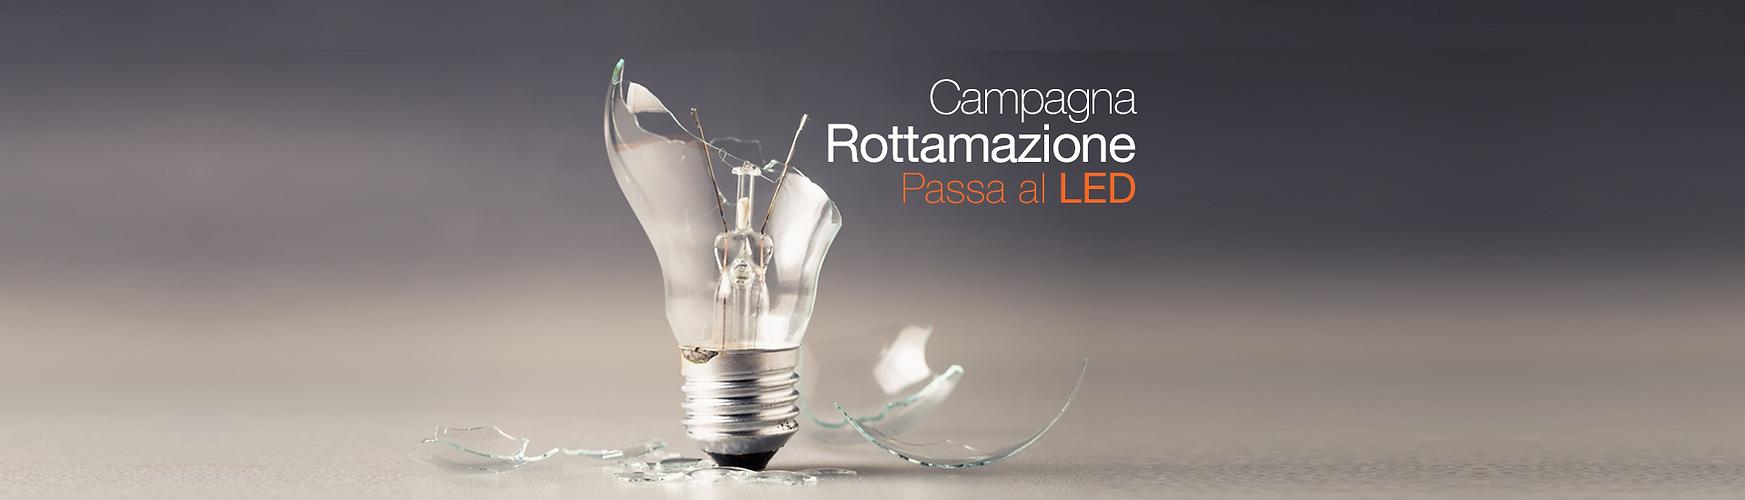 Campagna rottamazione LED